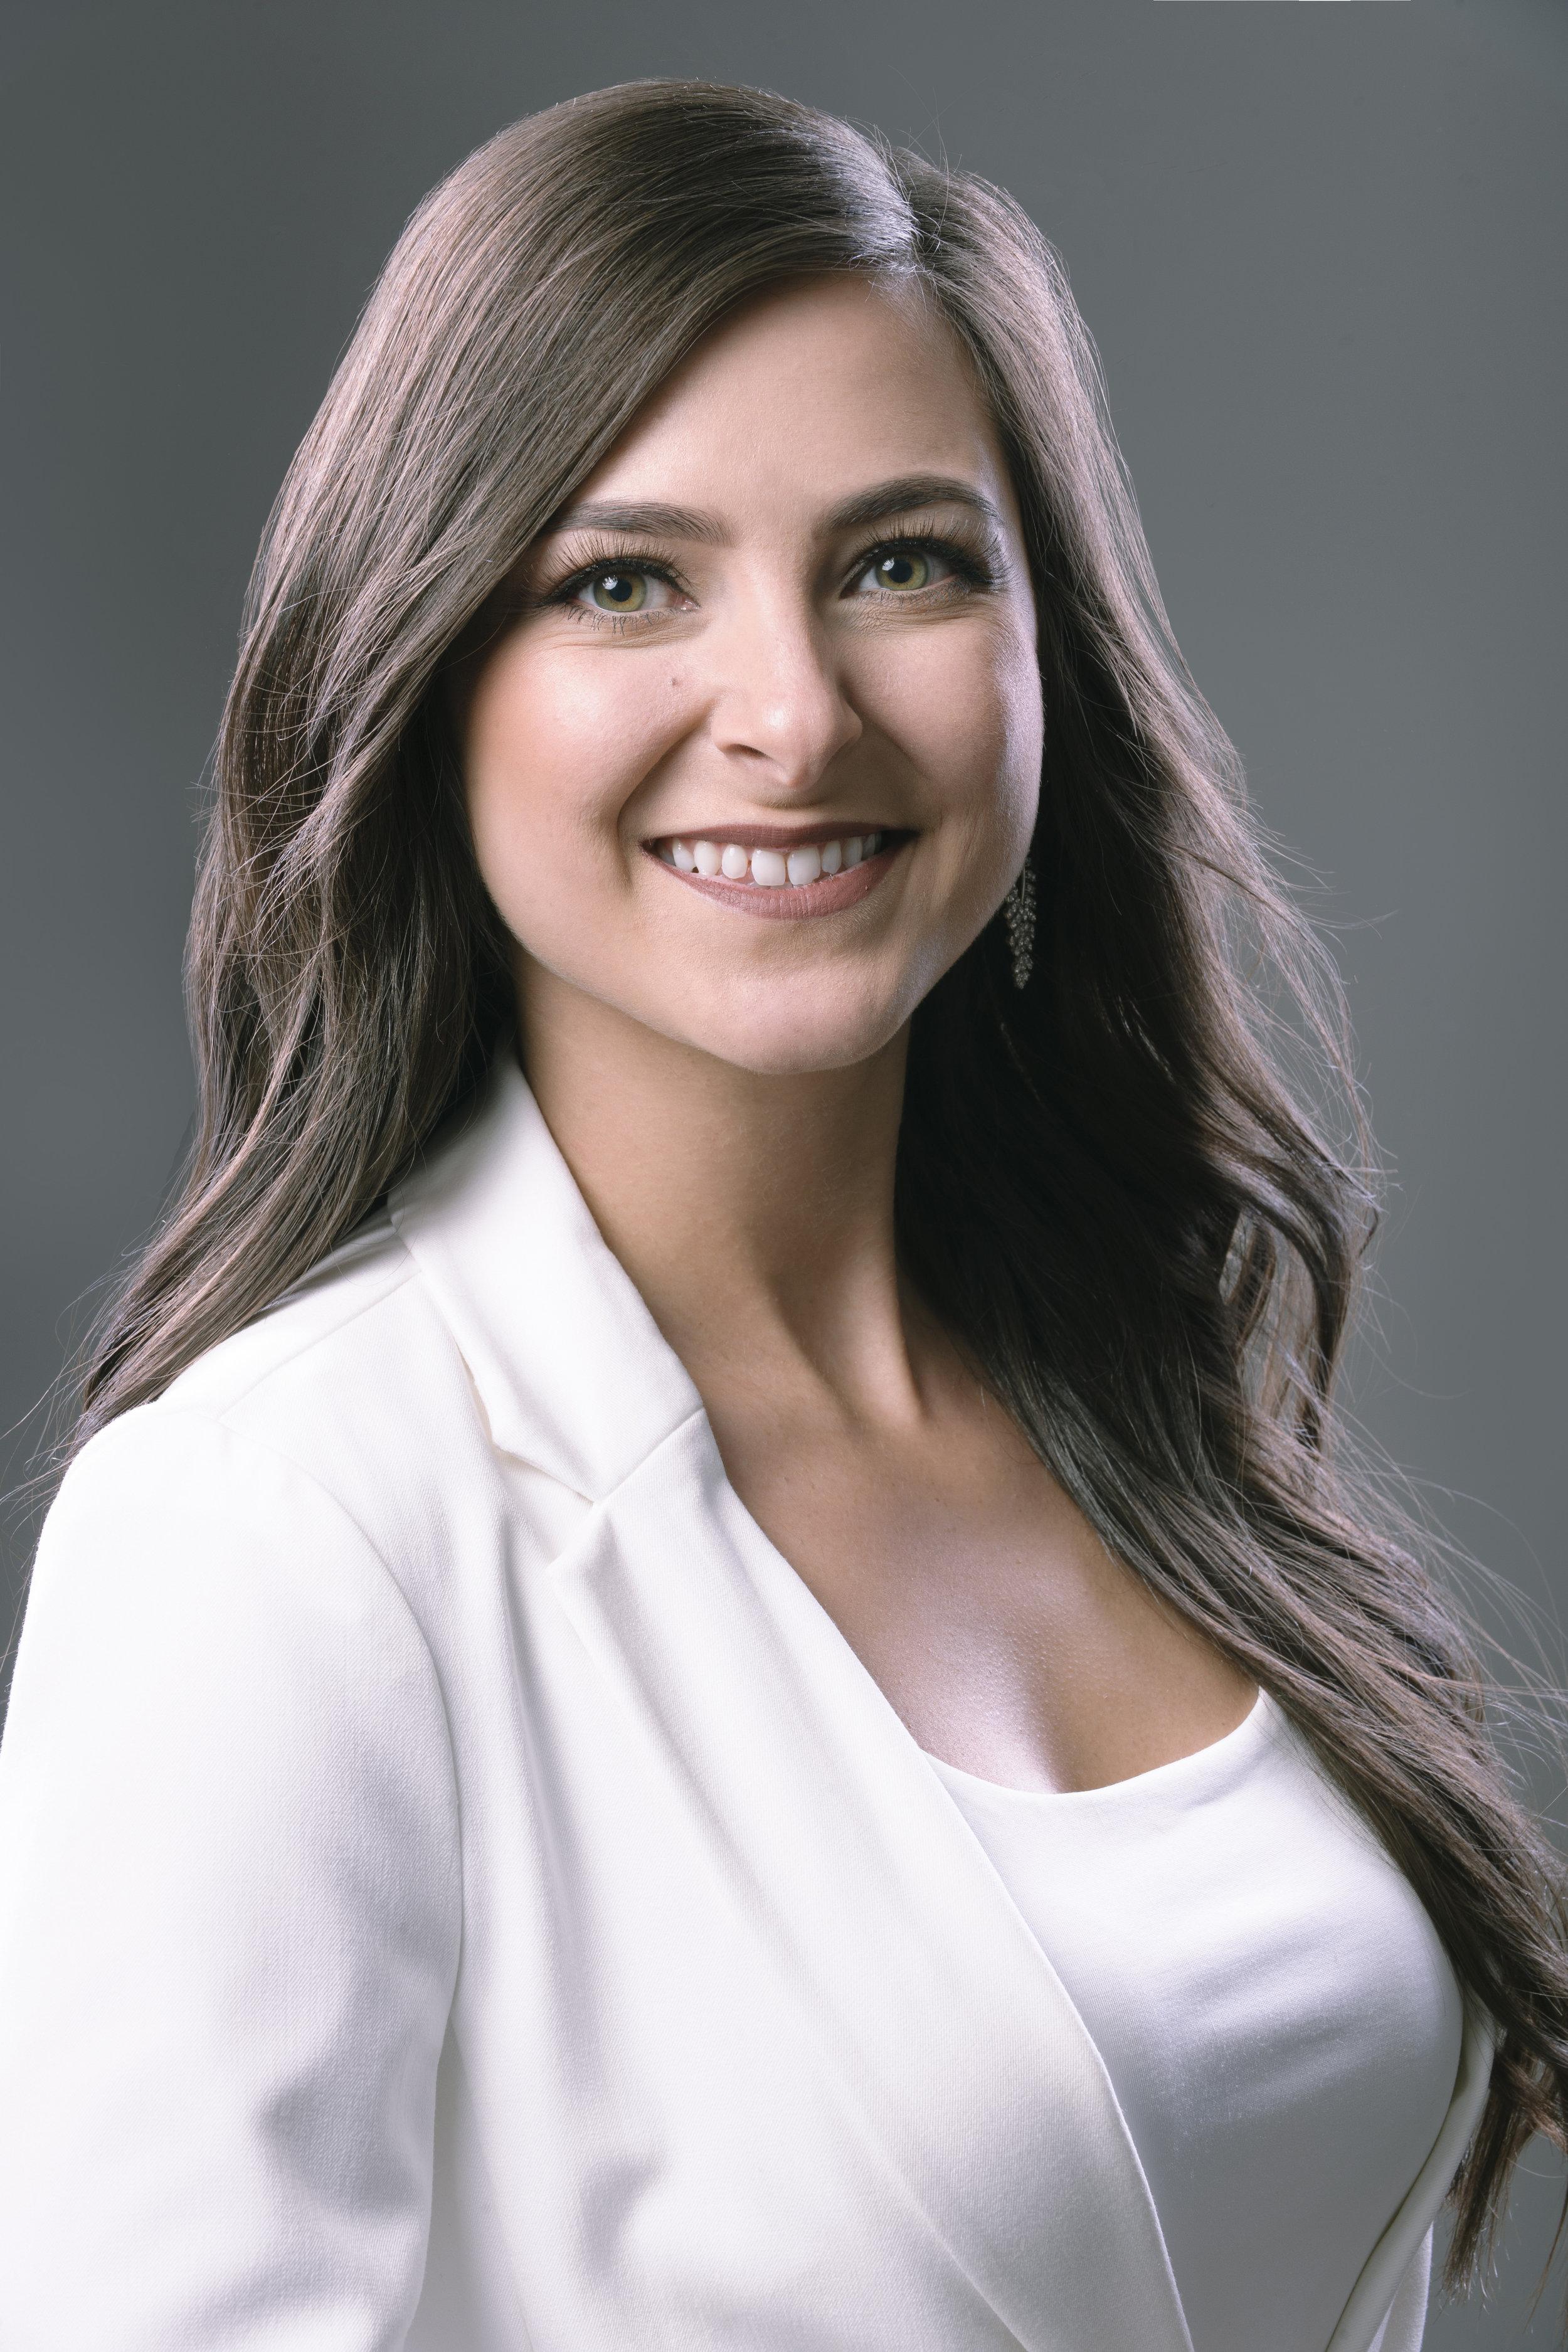 Maria Giorlando